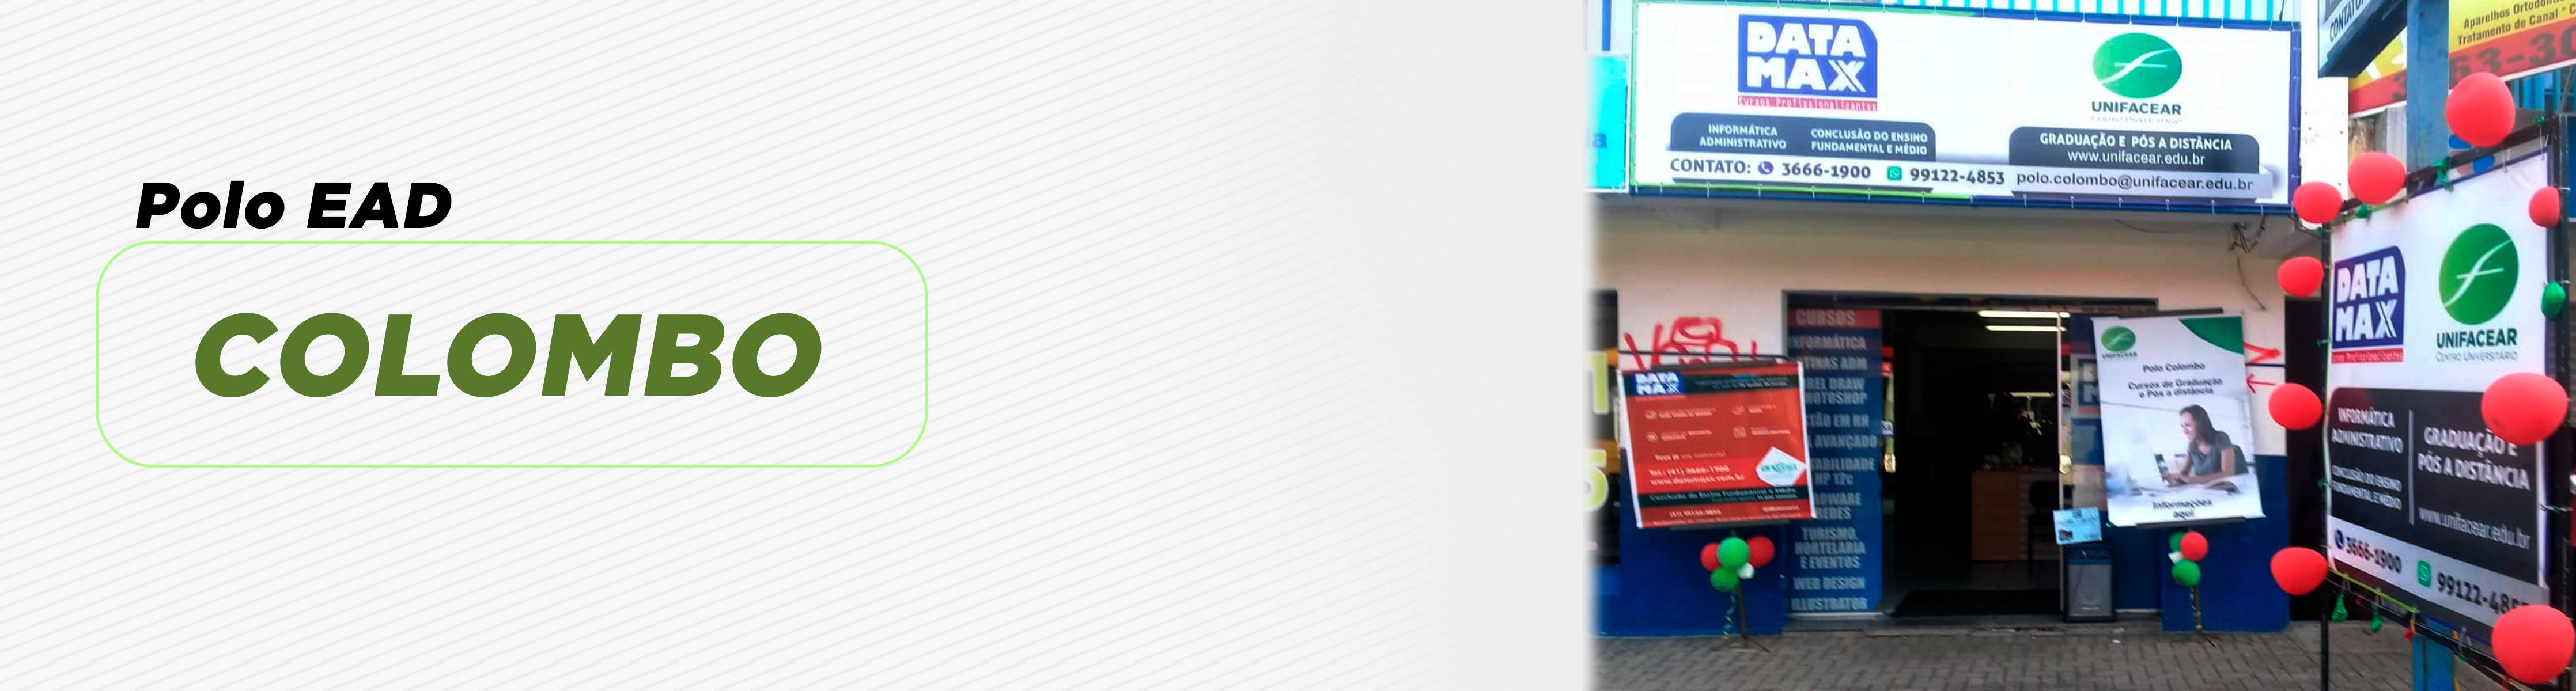 polo-colombo-unifacear